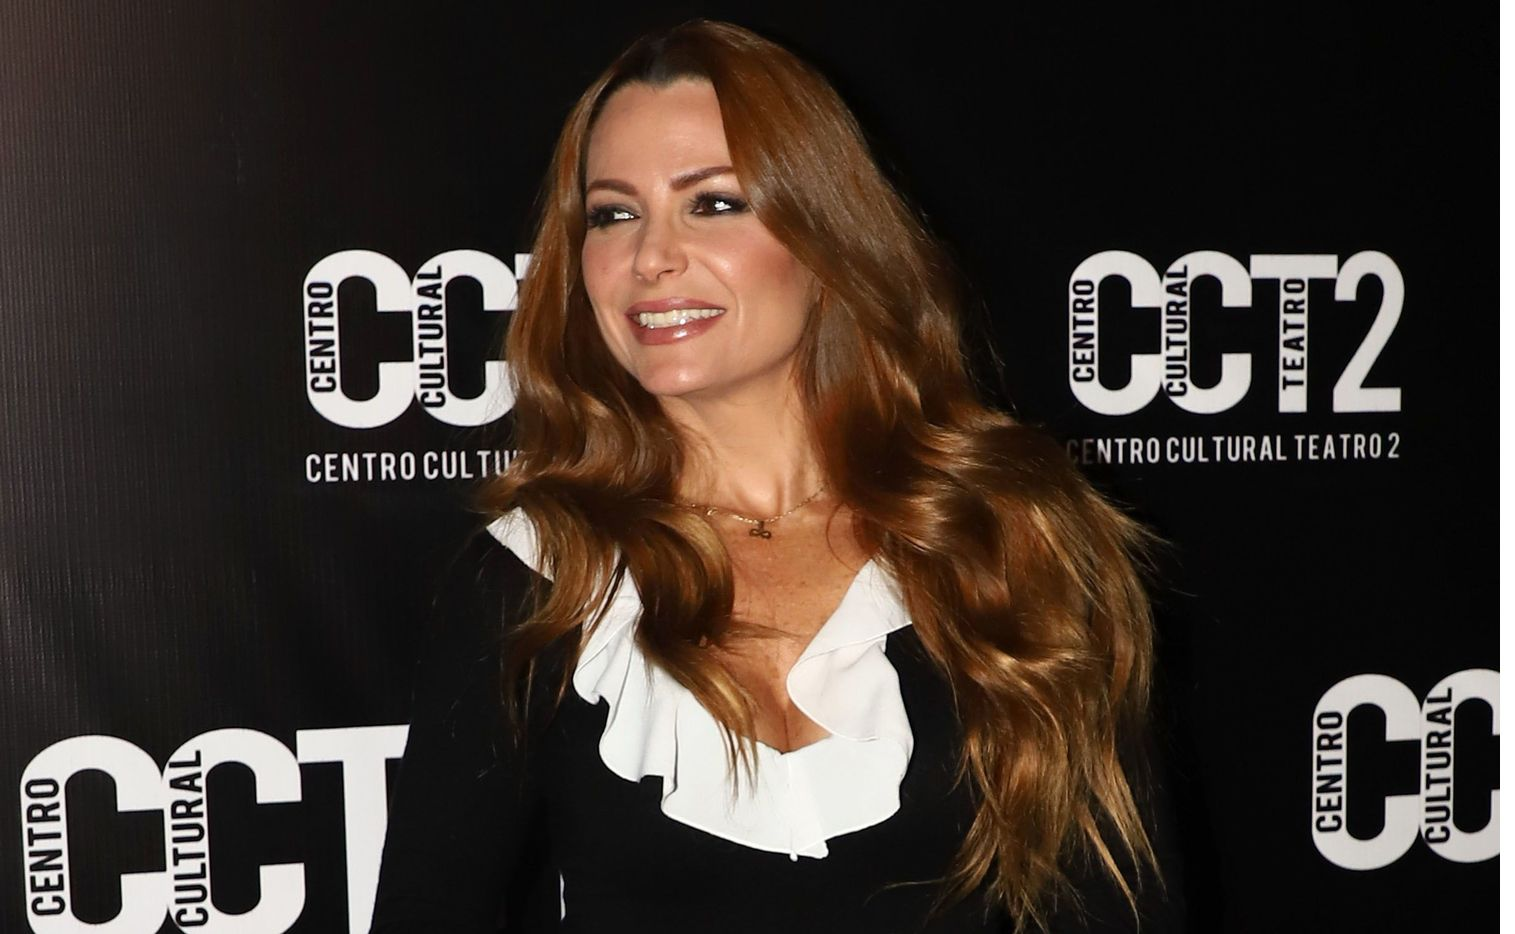 Martha Julia es parte del elenco de El Club, serie transmitida por Netflix.